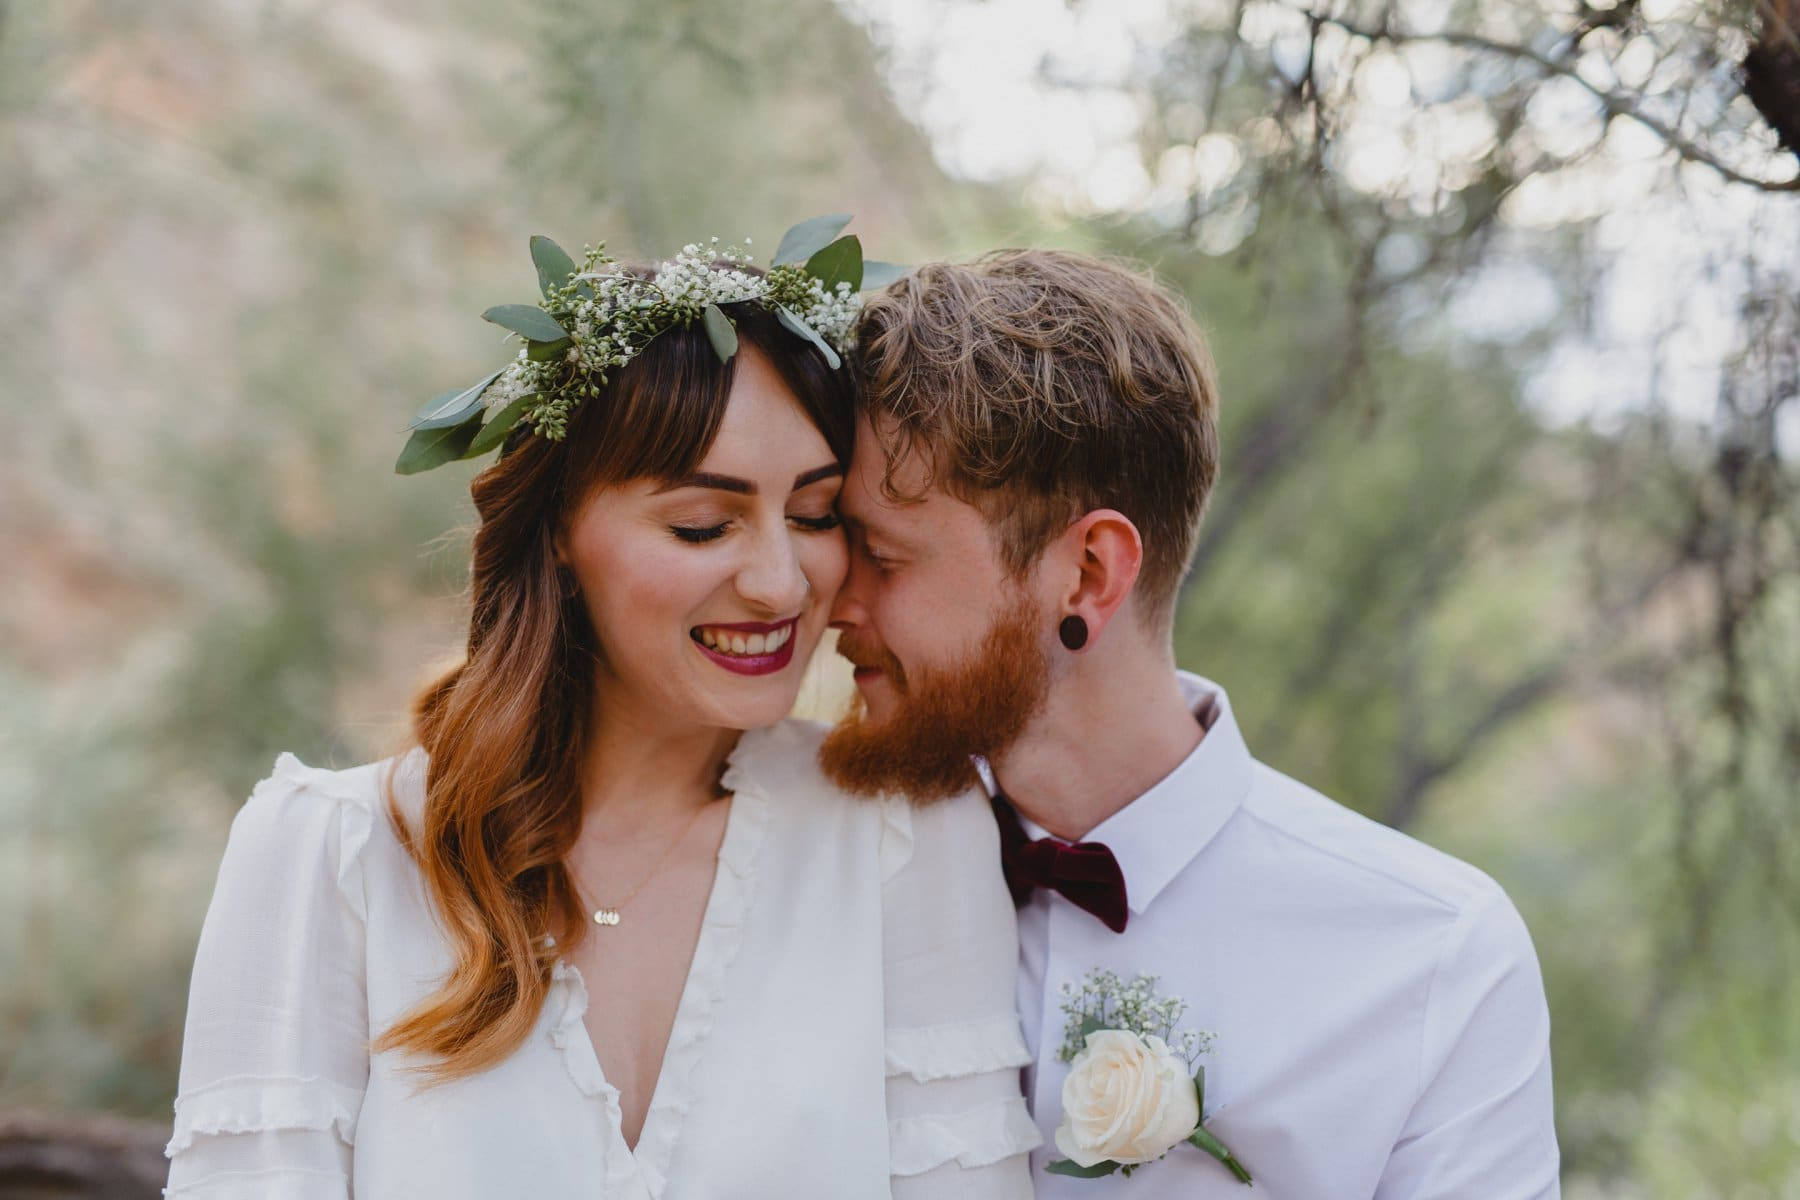 sweet outdoor elopement with flower crown